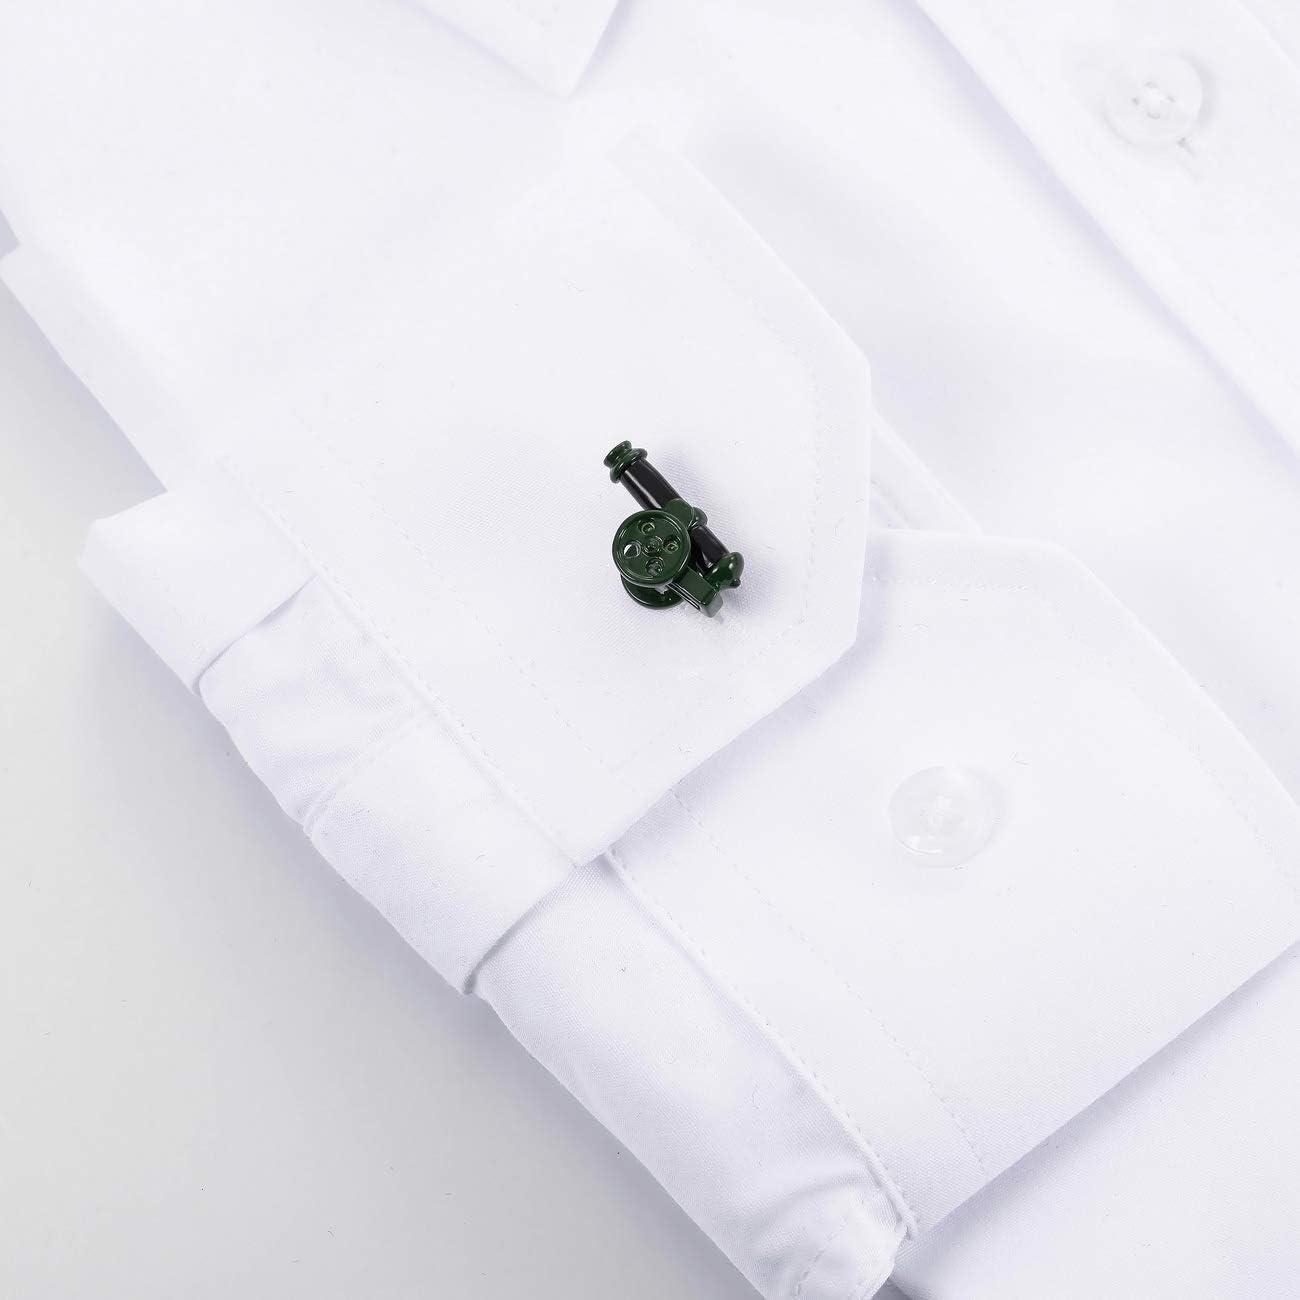 MOWOM 2PCS Rhodium Plated Cufflinks Shirt Wedding Business